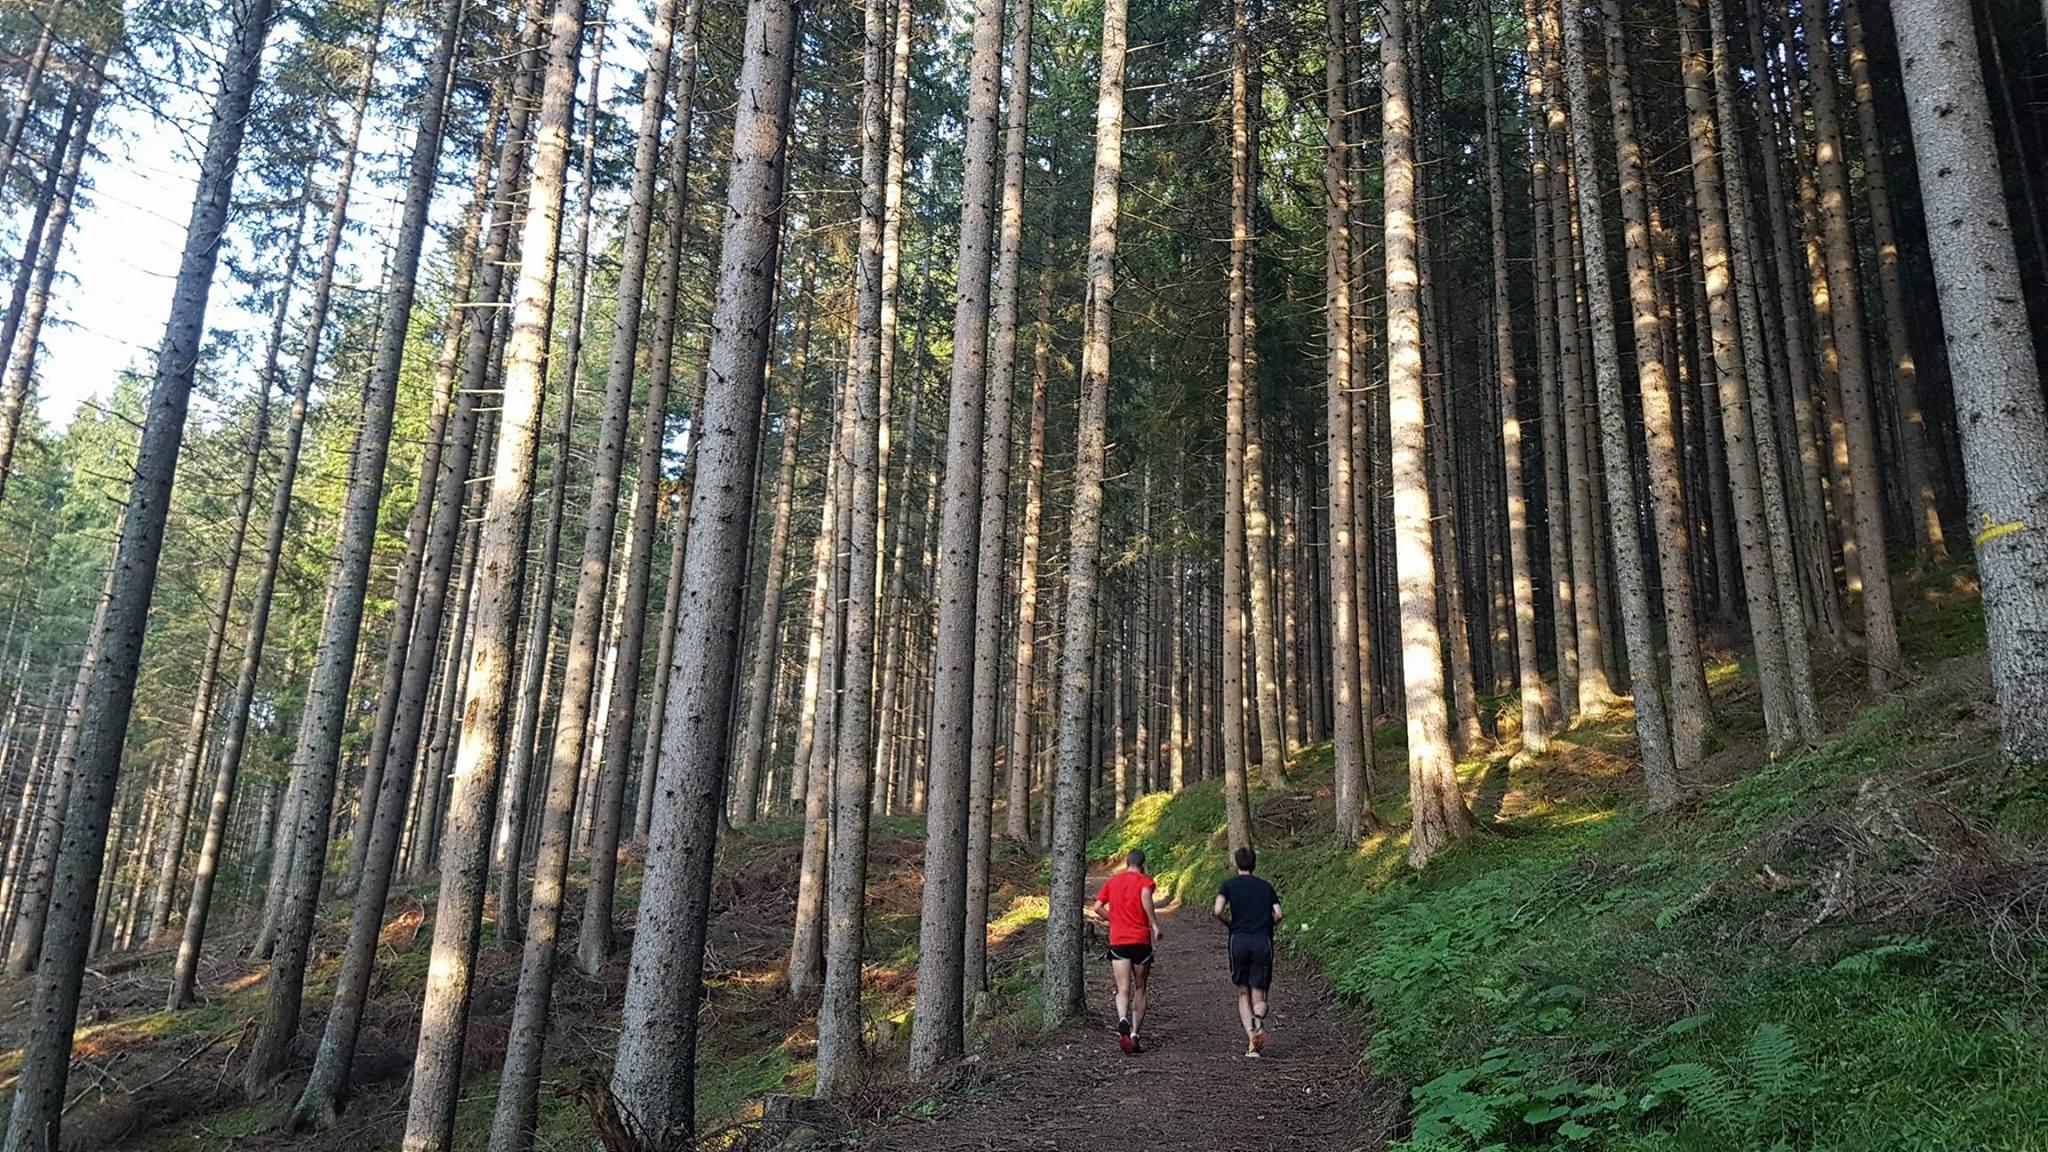 MattS and Adrian running through the forest near Nova Levante. Photo by MattT.